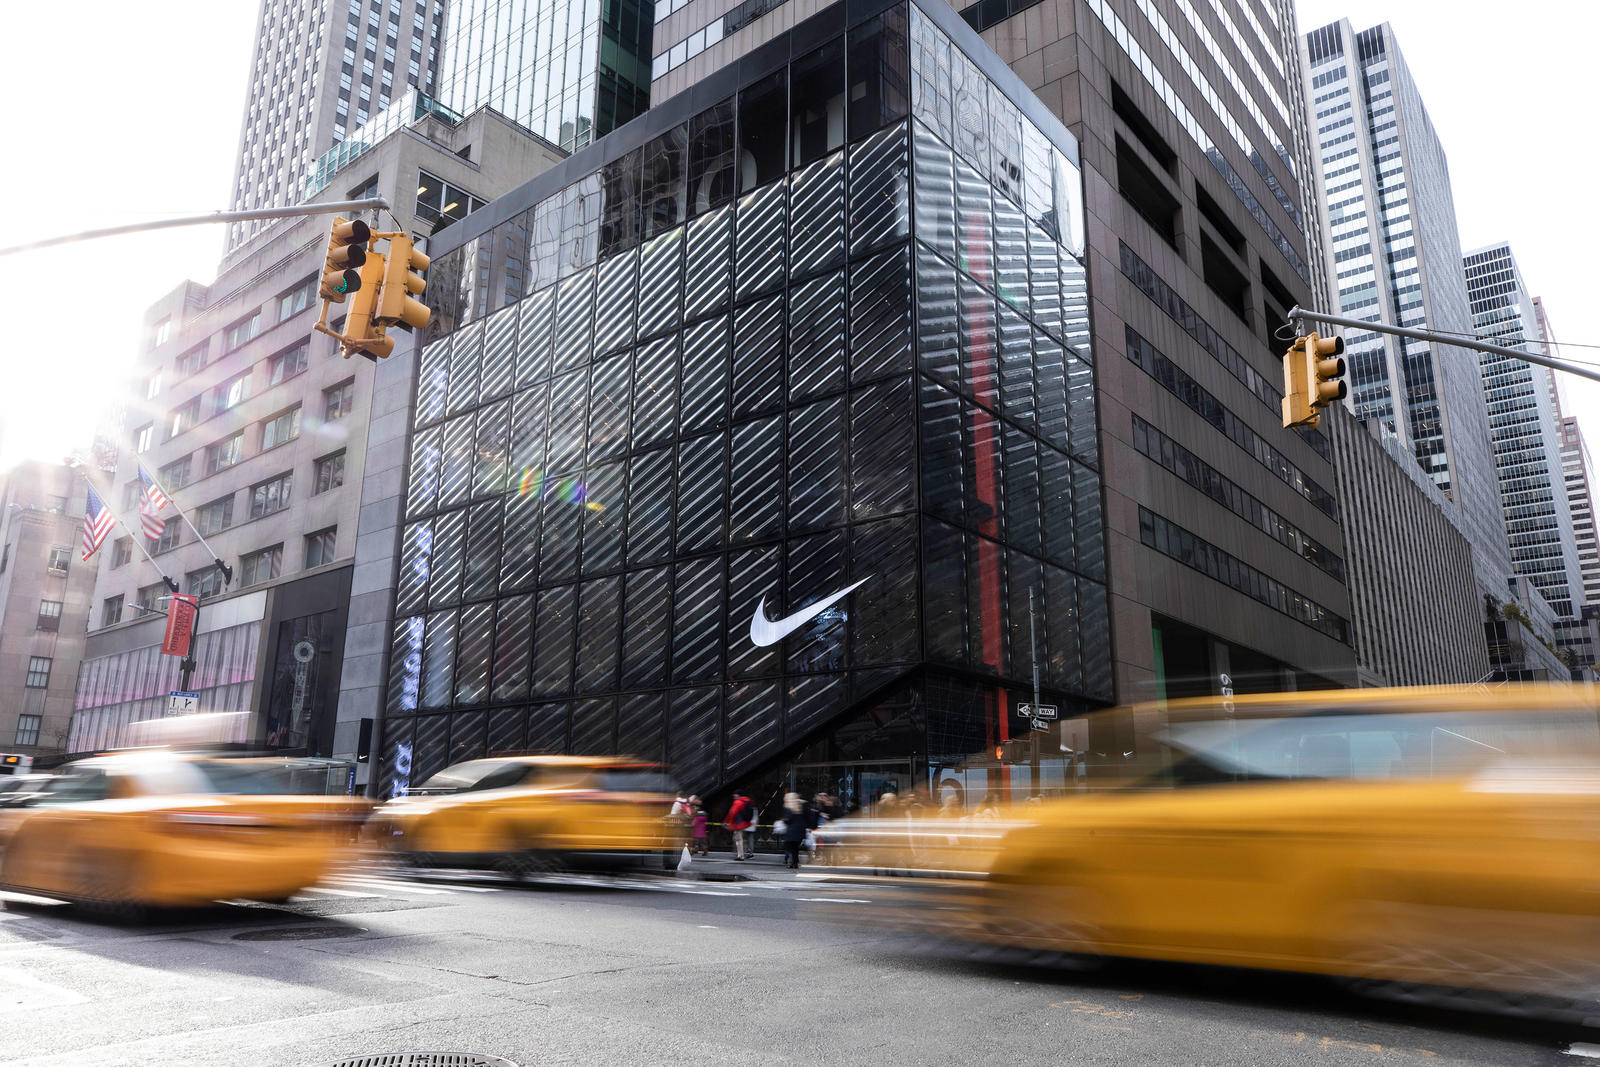 NikeNYC_HouseOfInnovation_hetrick_cleanselects_0087_83672